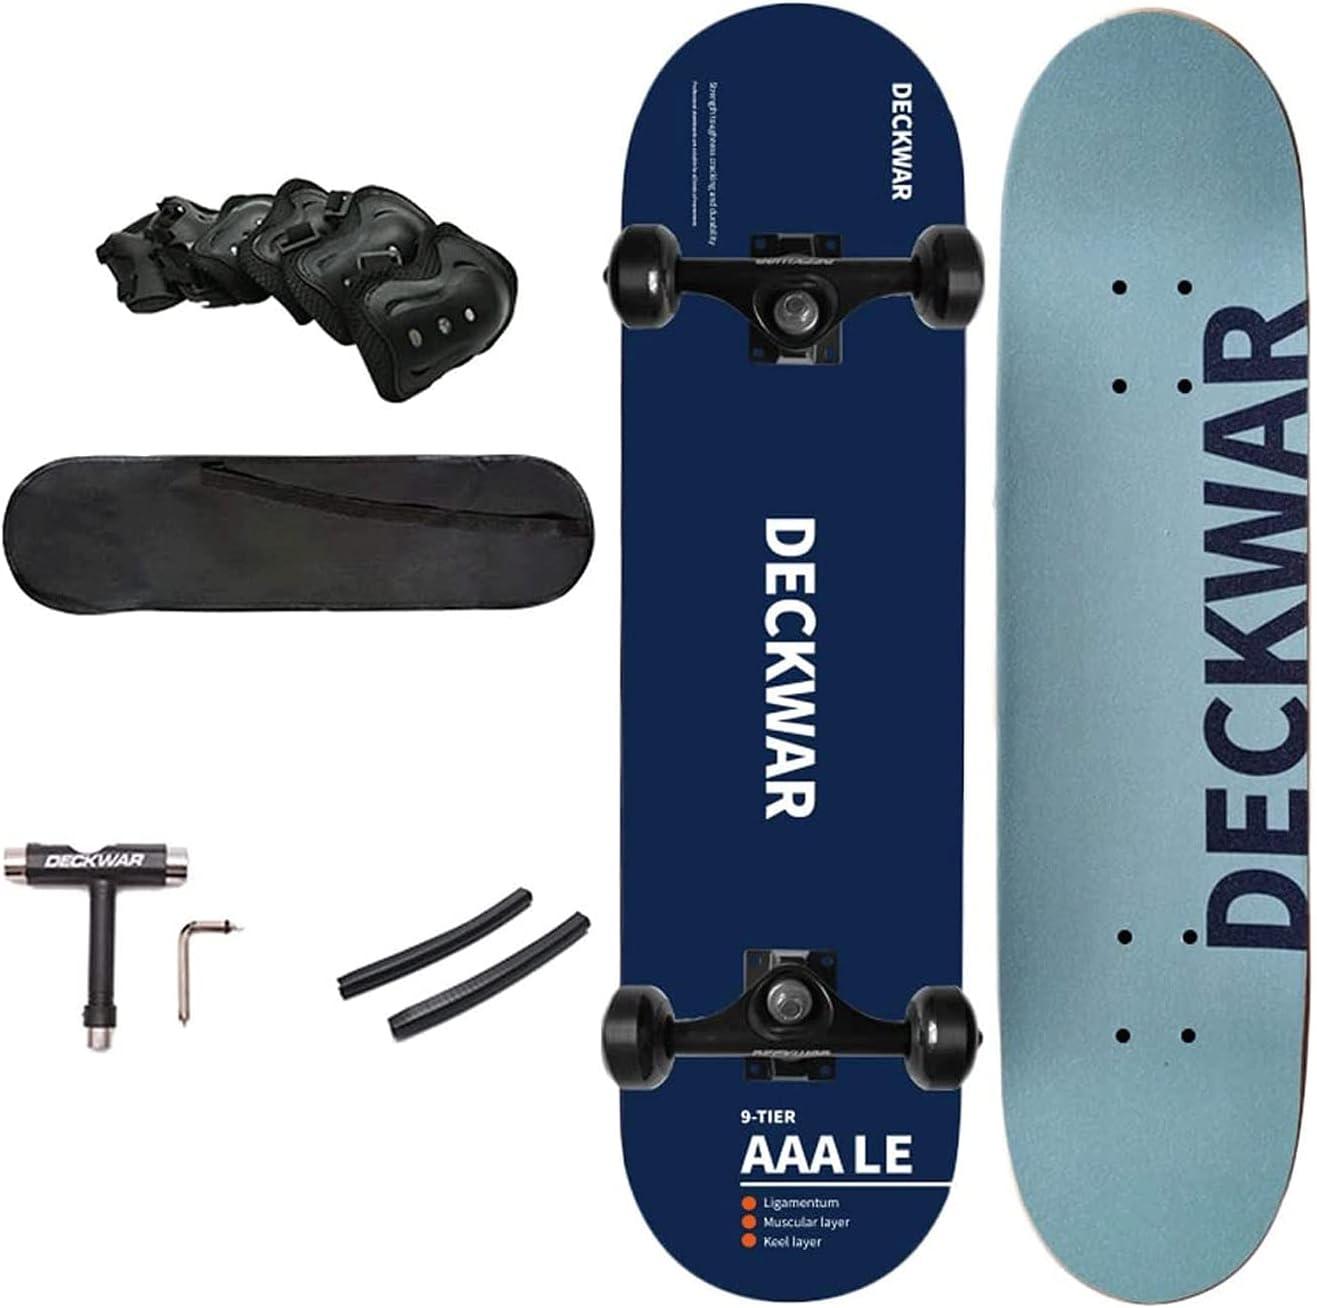 EEGUAI Tampa Mall 31 inch Skateboard Double Skate Longbo Cruiser Kick Seasonal Wrap Introduction Board